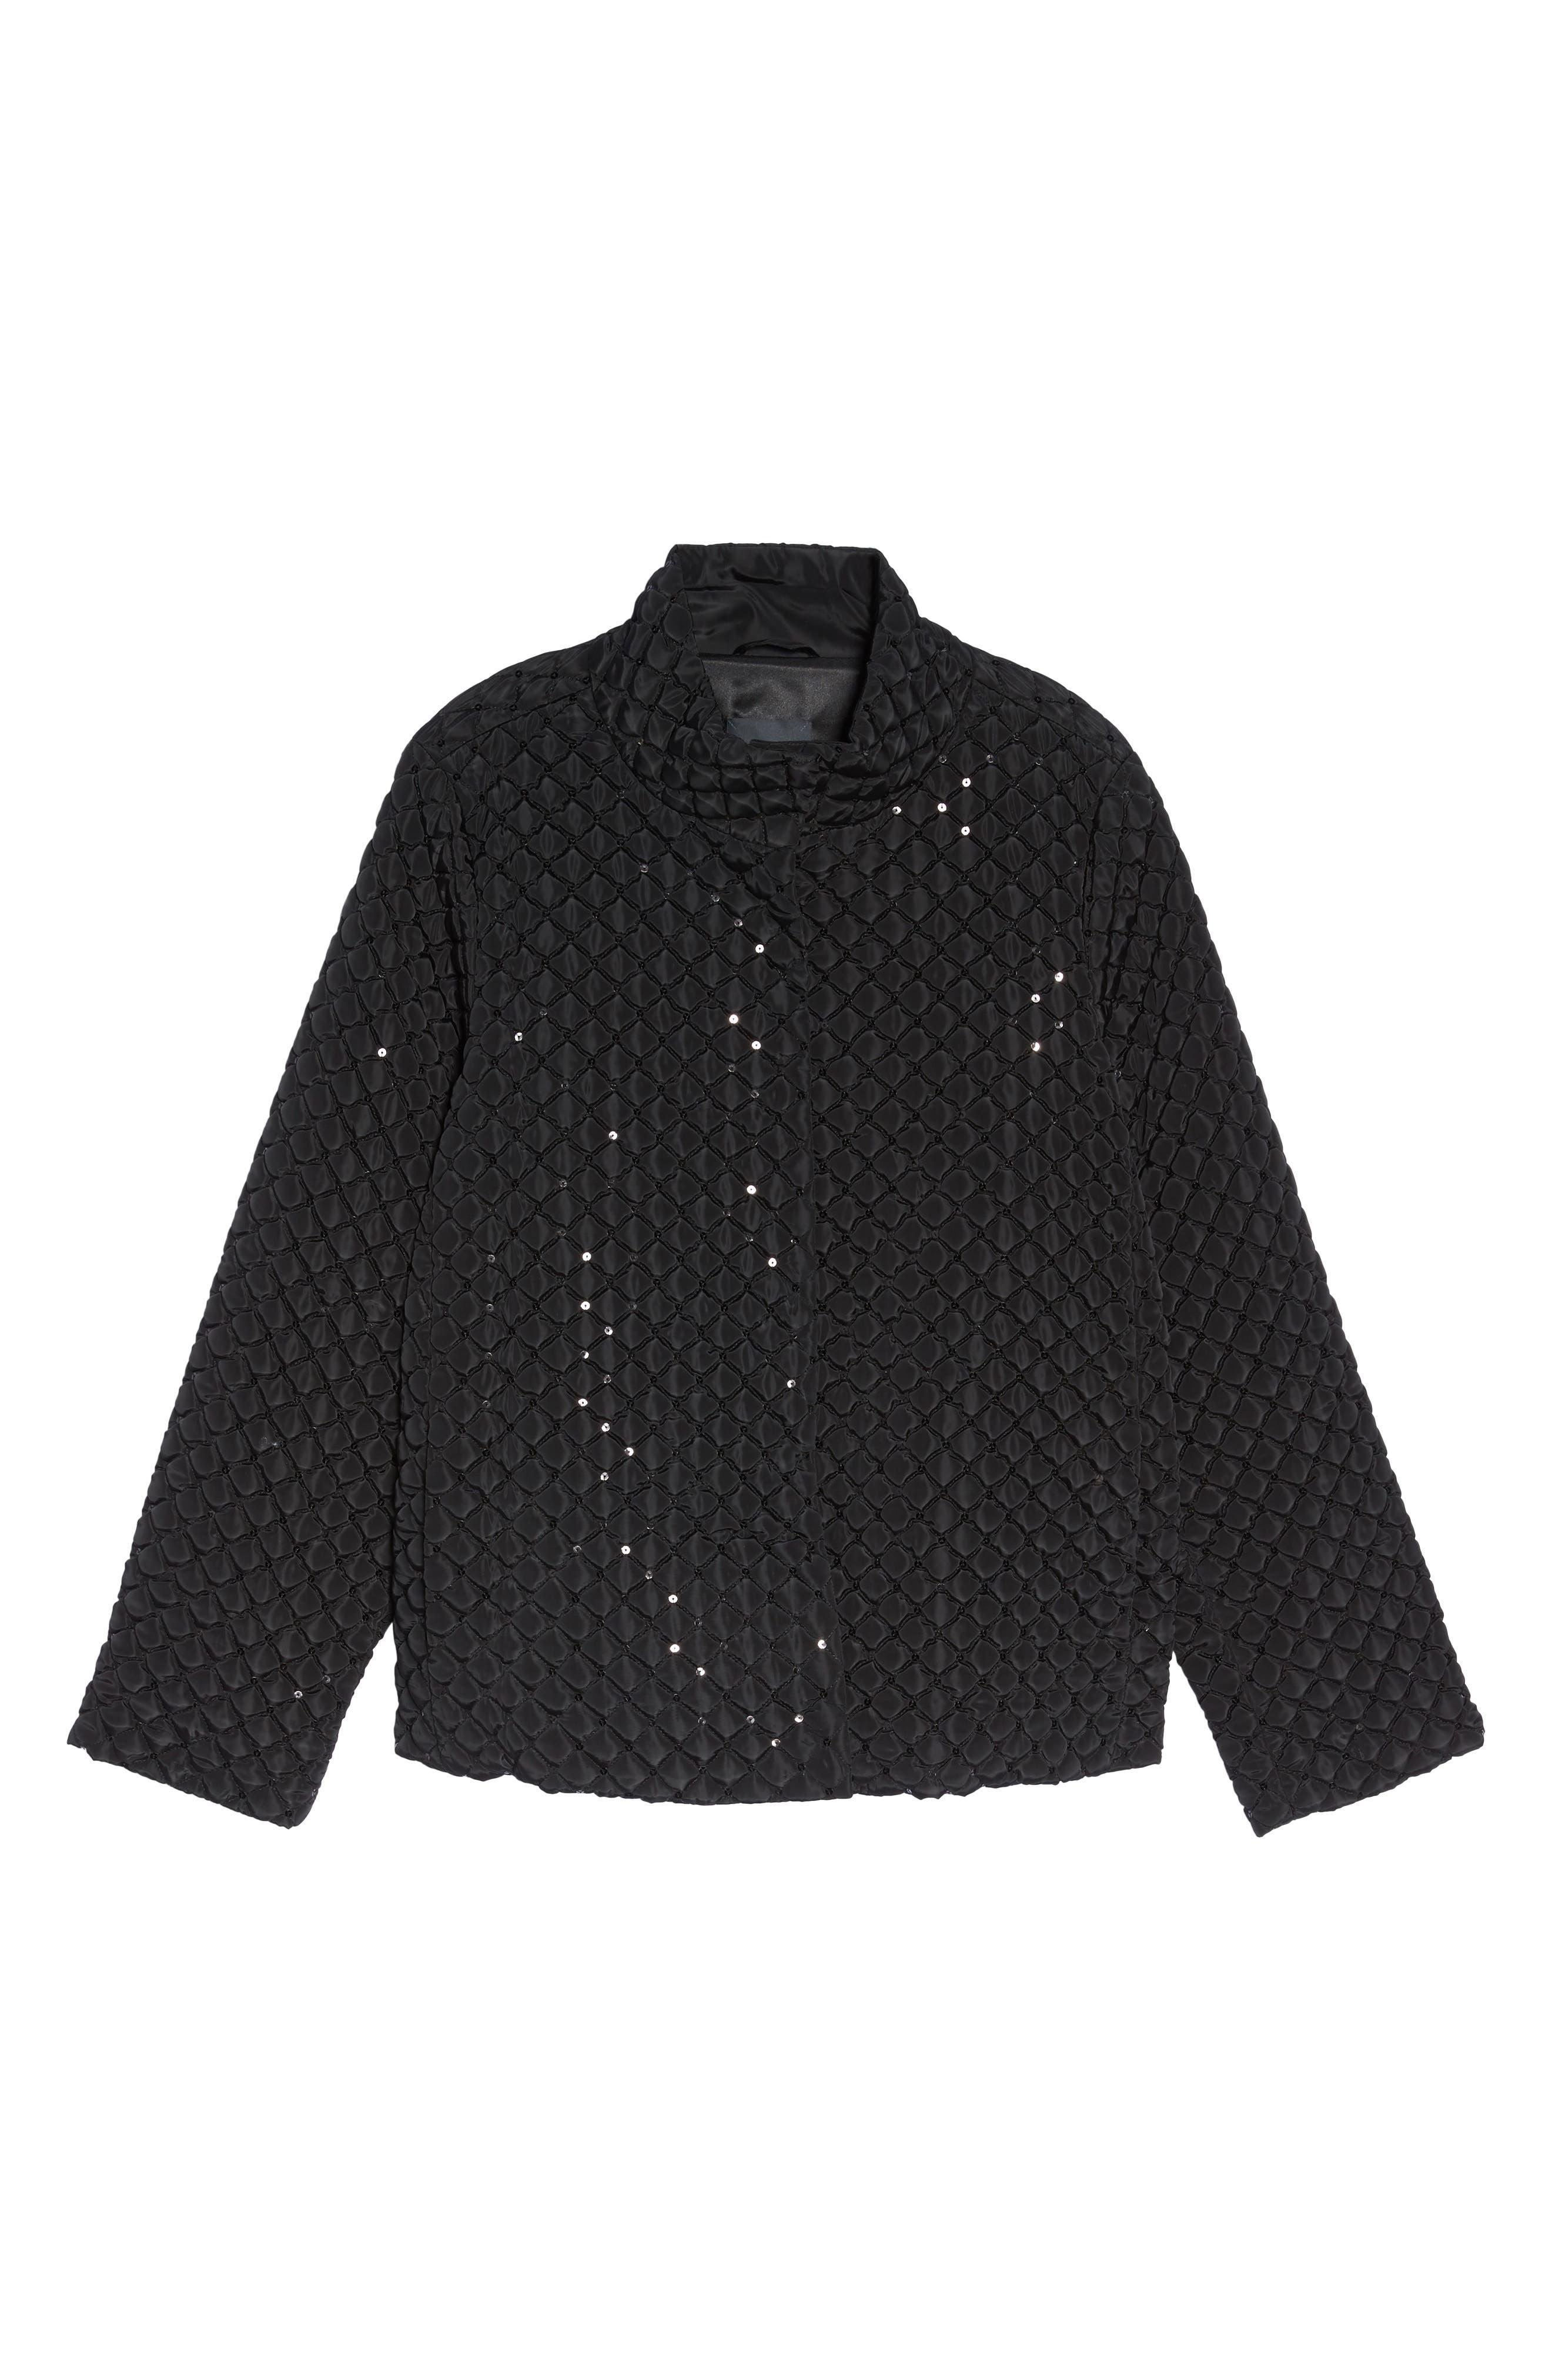 Papaia Sequin Jacket,                             Alternate thumbnail 5, color,                             001